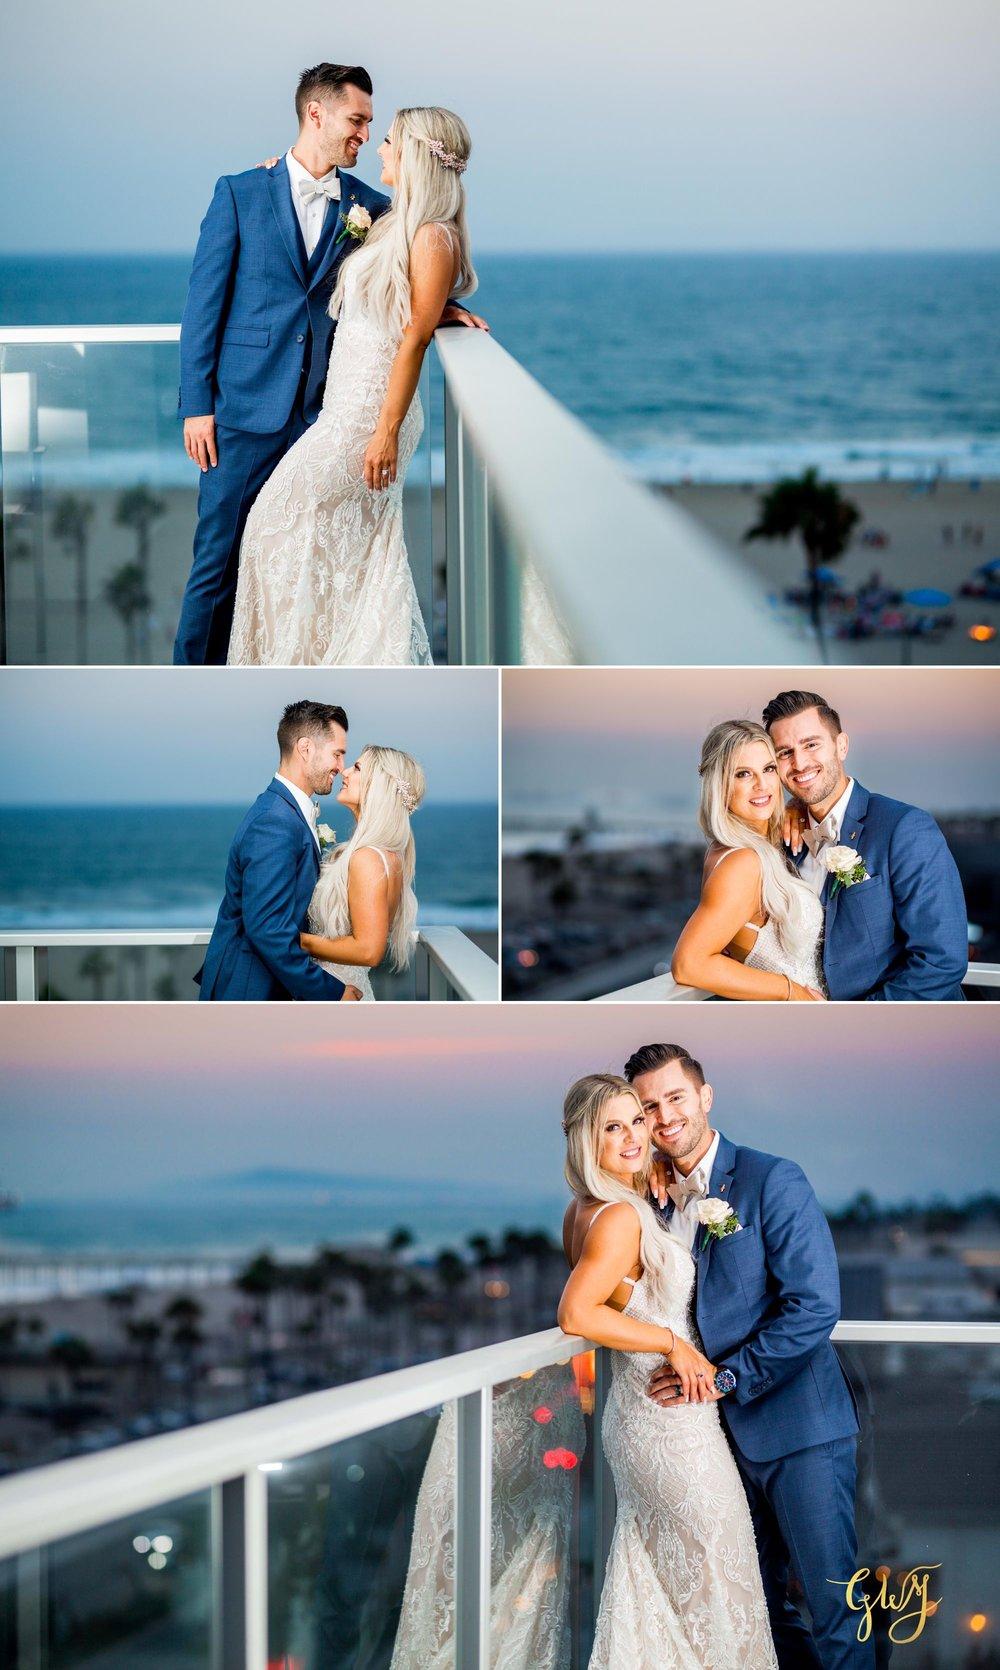 Christien + Crystal Pasea Hotel & Spa Huntington Beach Wedding by Glass Woods Meida 2 10.jpg